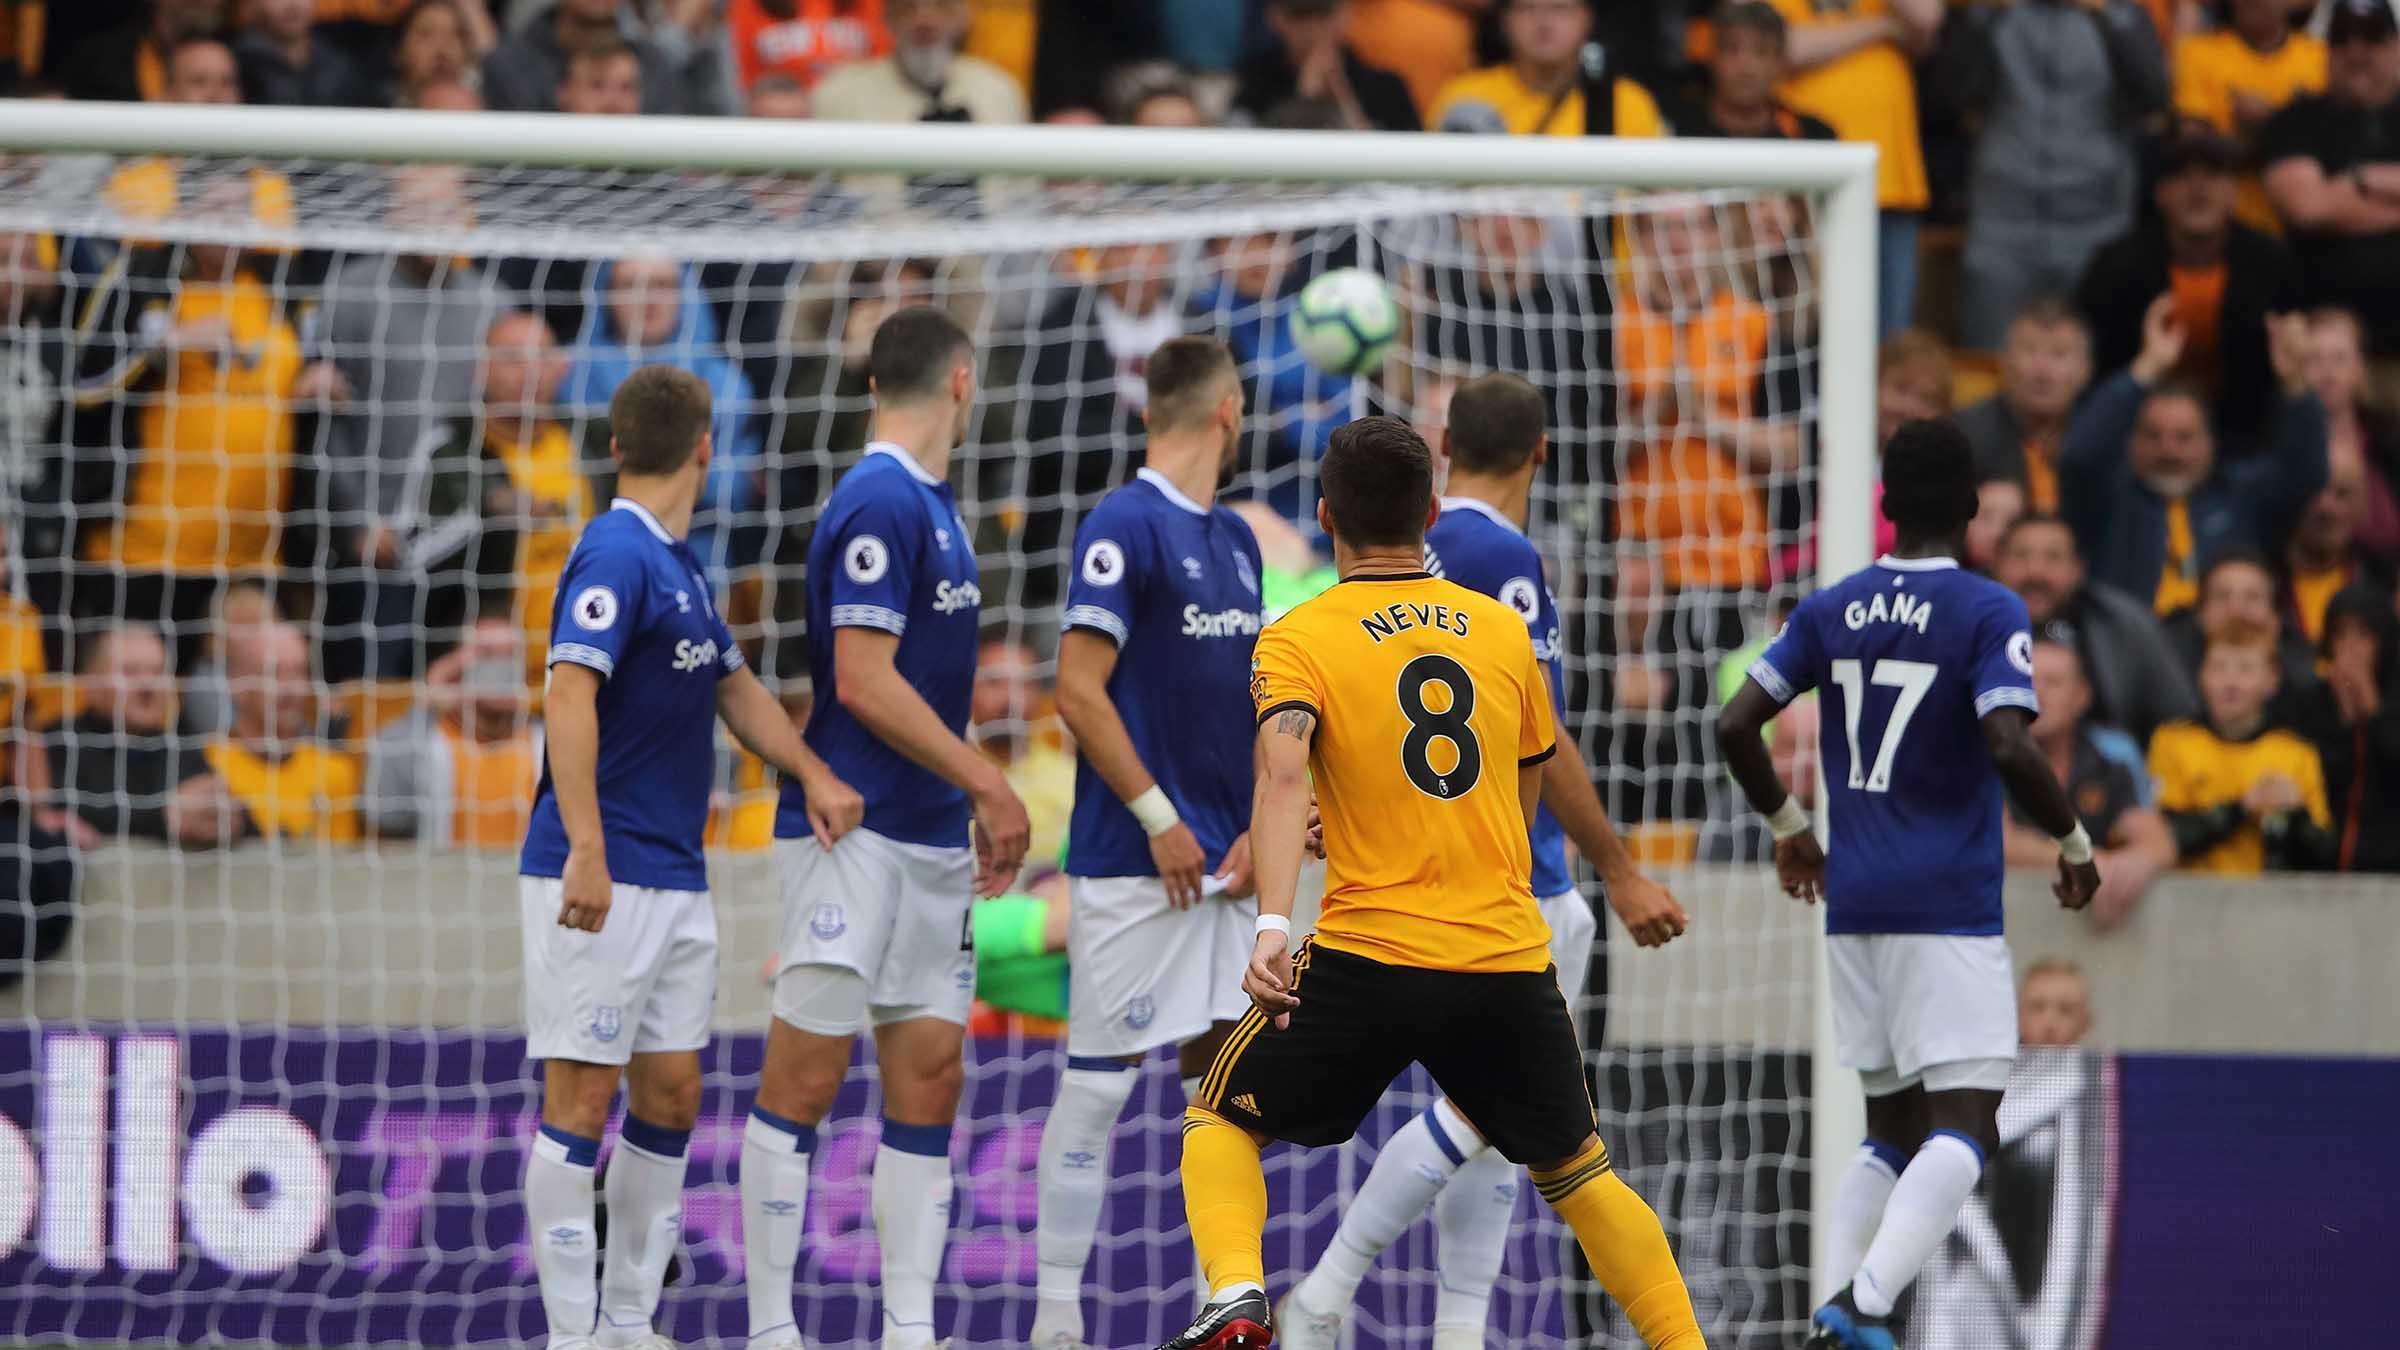 Wolves 2-2 Everton | Match Report | Wolverhampton Wanderers FC